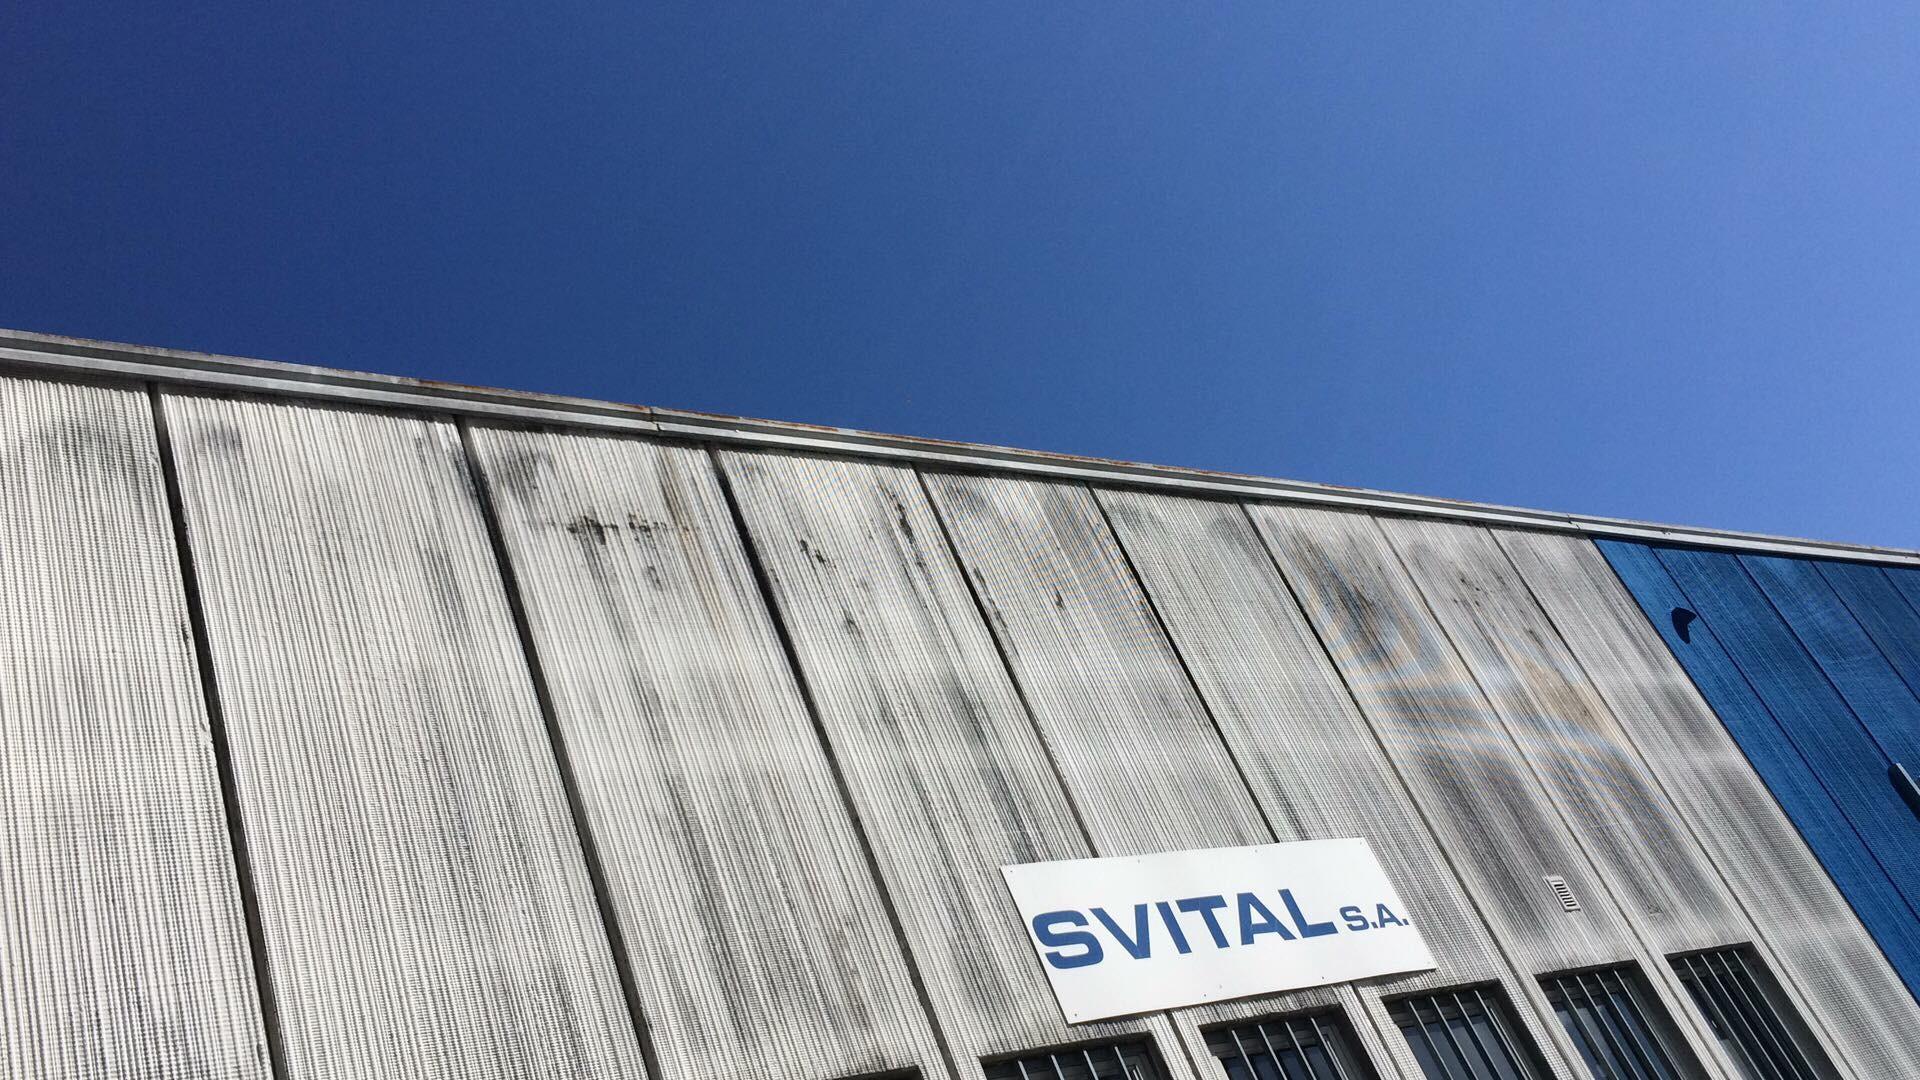 Carpentieri Edili In Svizzera svital sa | linkedin